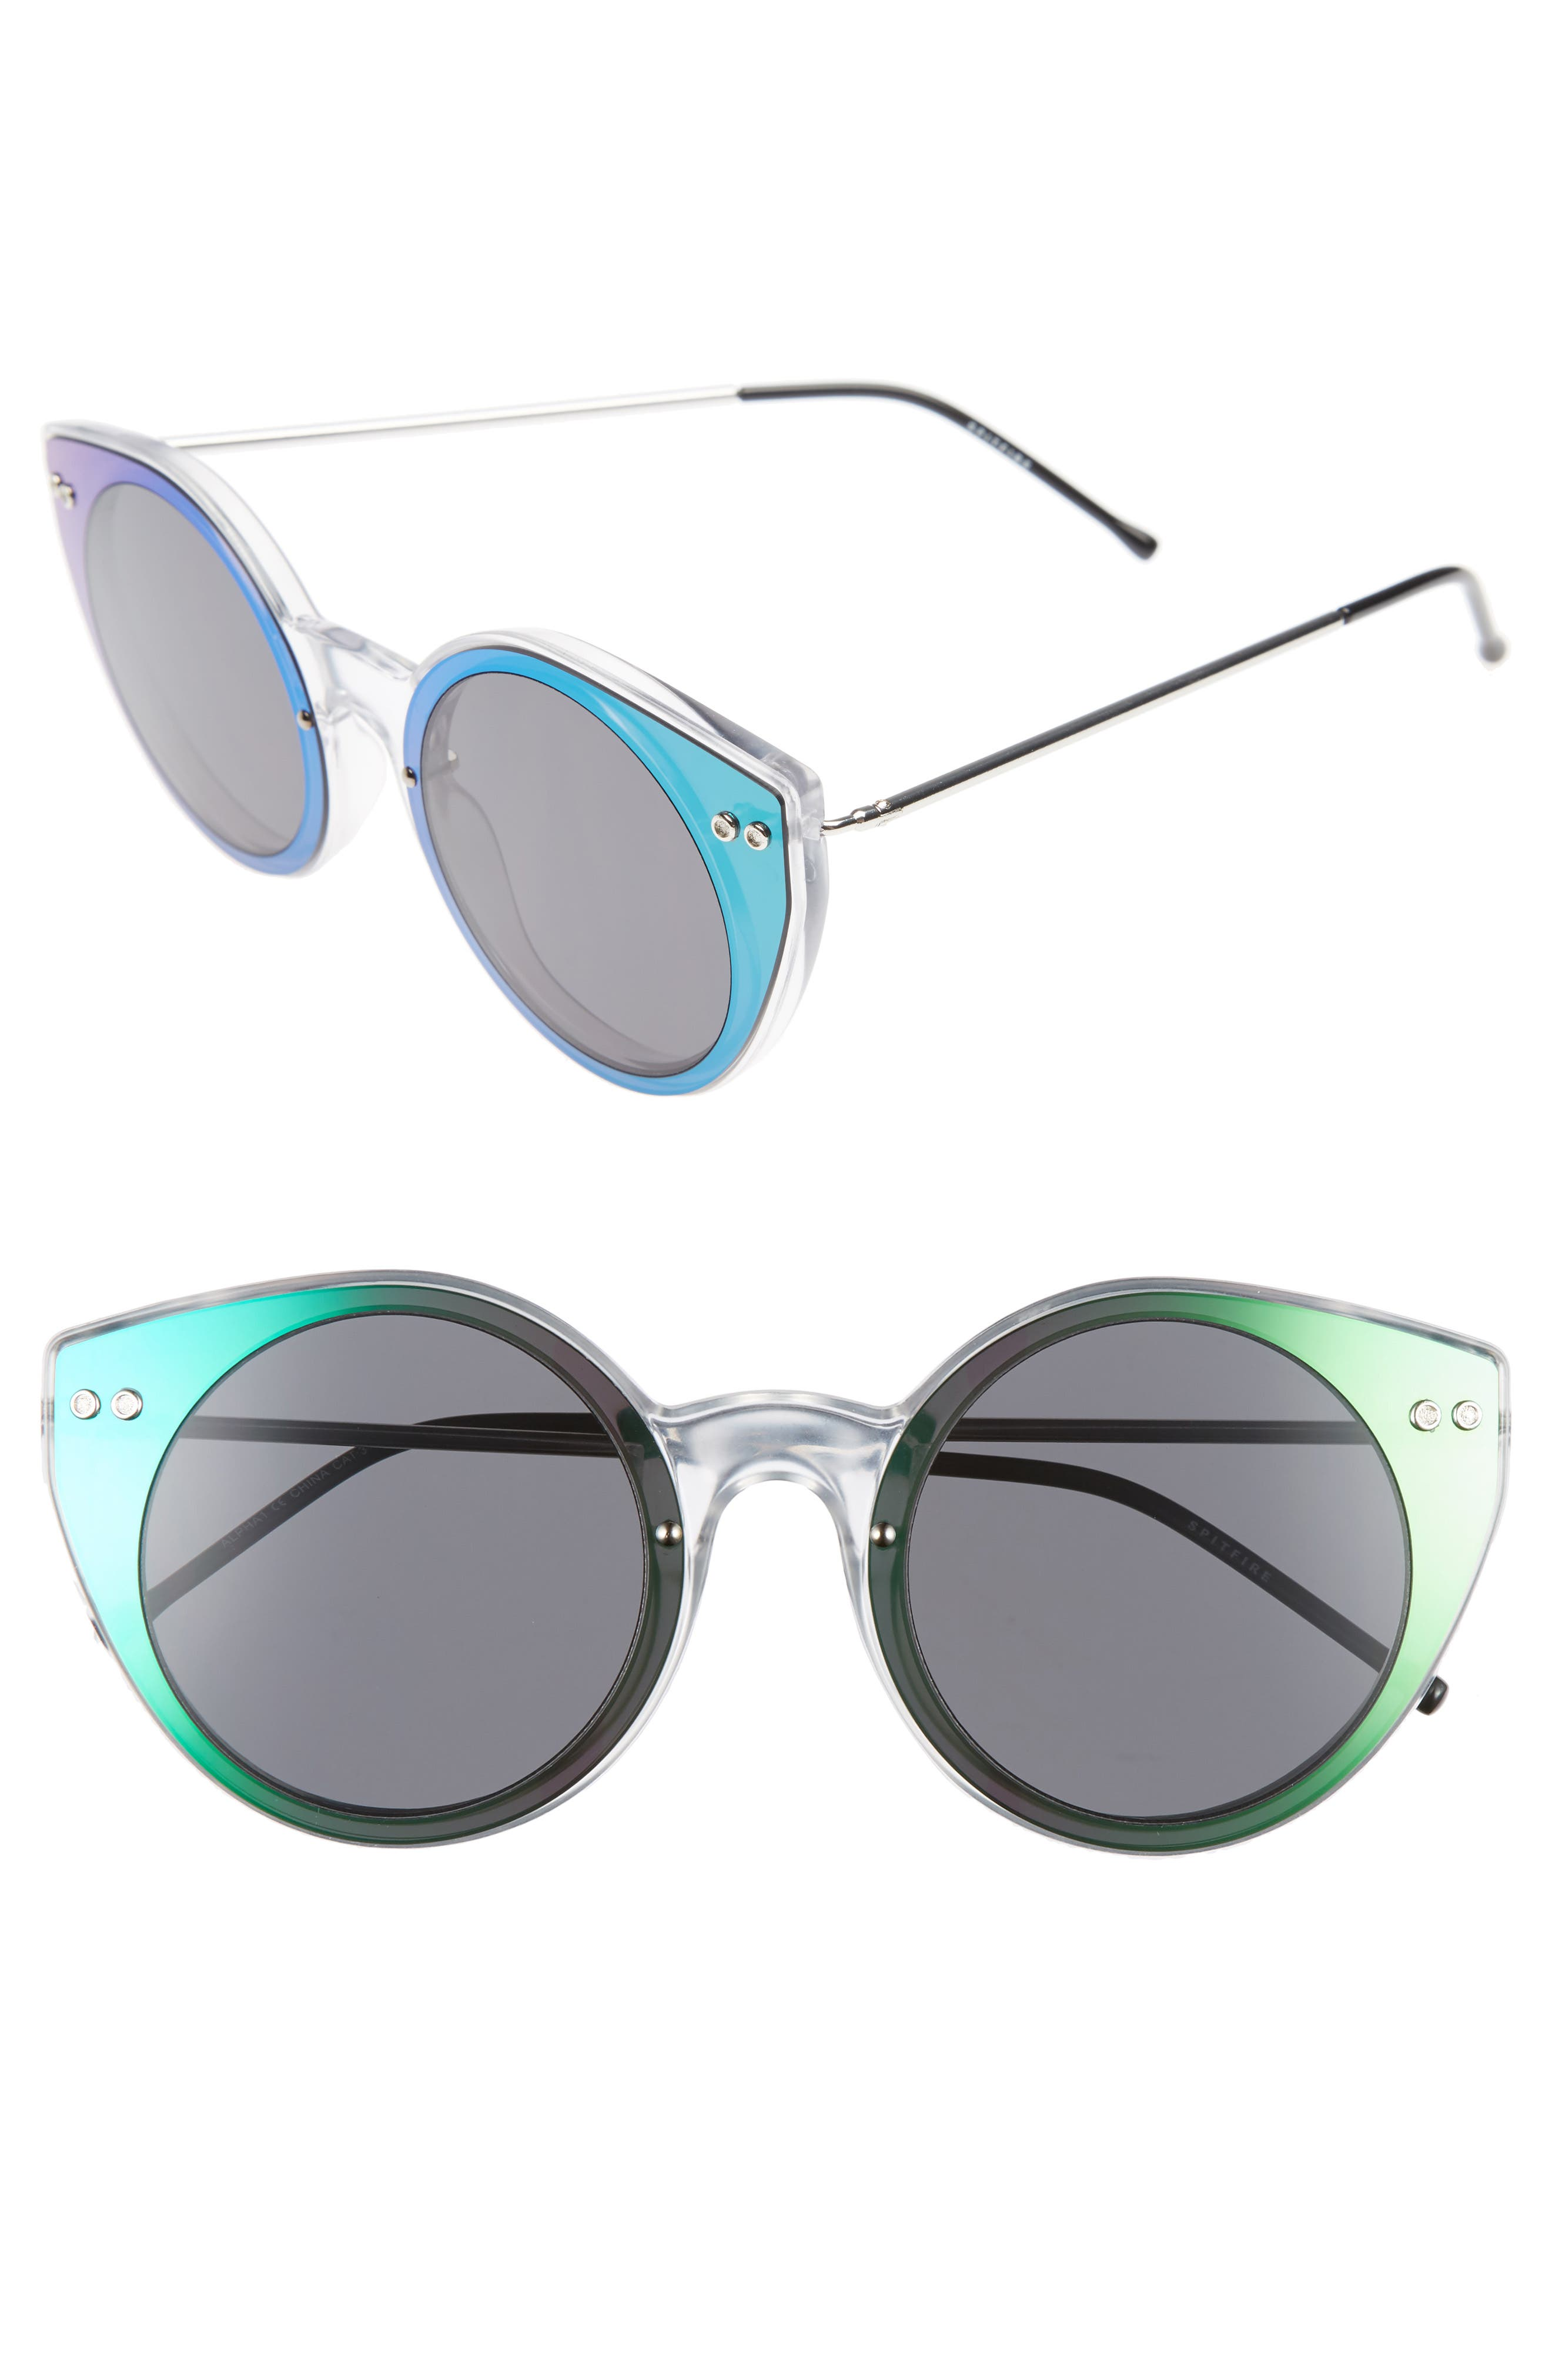 Spitfire Alpha 1 60mm Mirrored Sunglasses